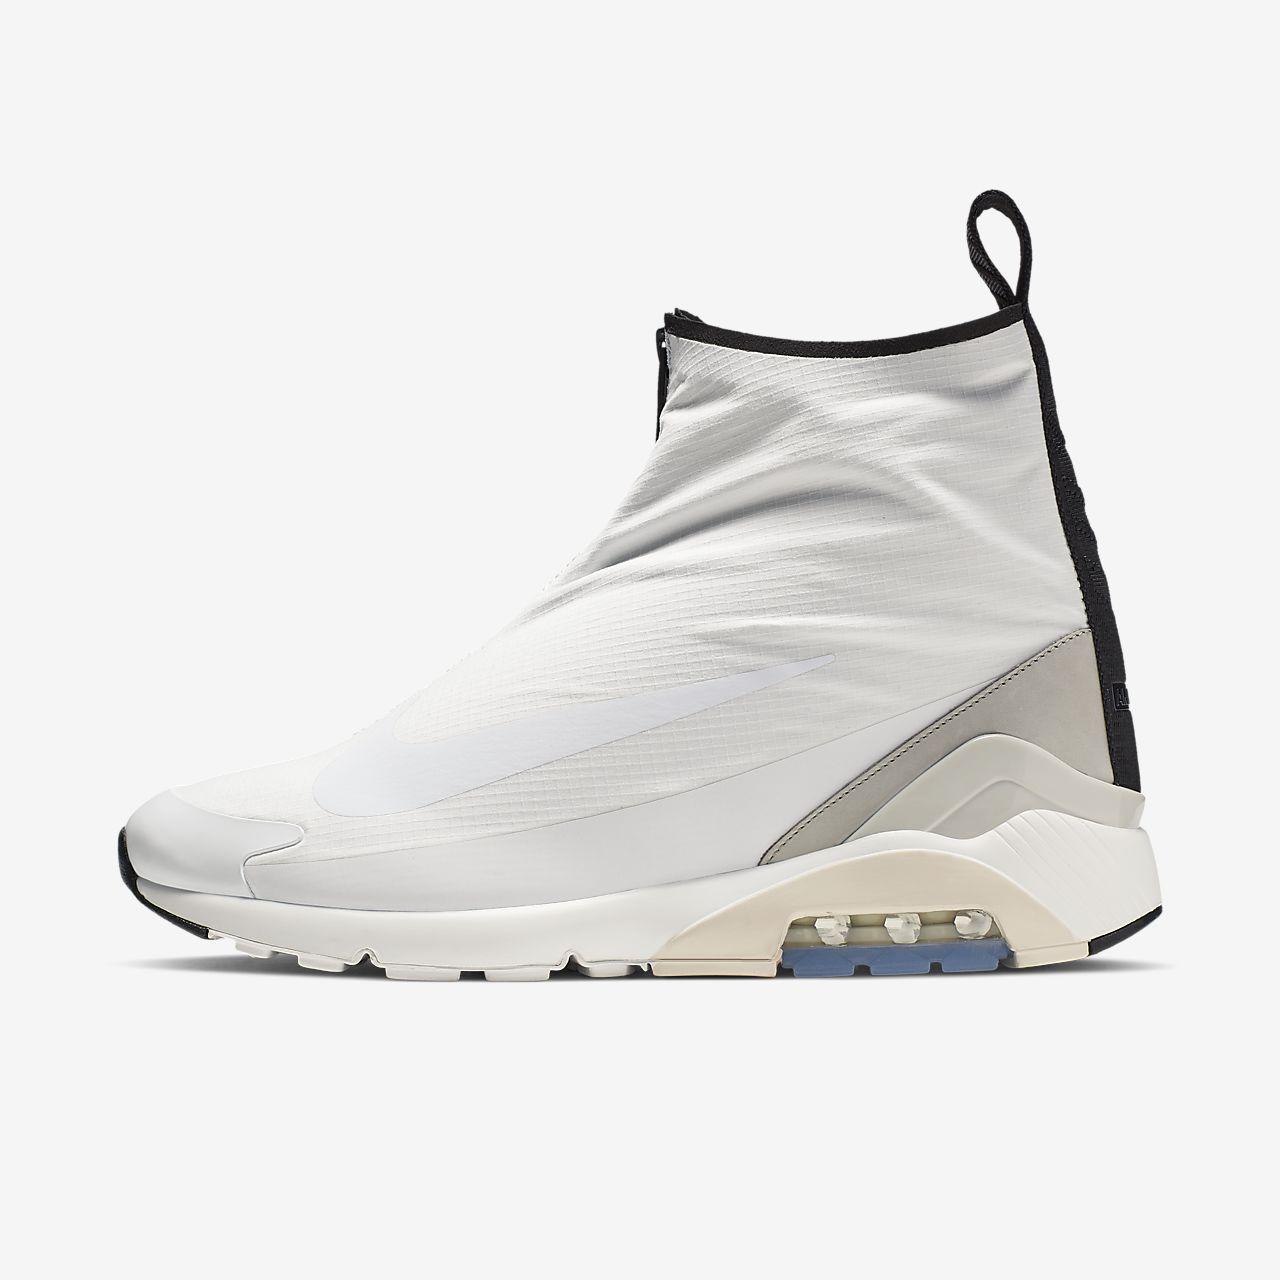 Details about [Pre Order] New Nike X Ambush Air Max 180 HI Size 5 White